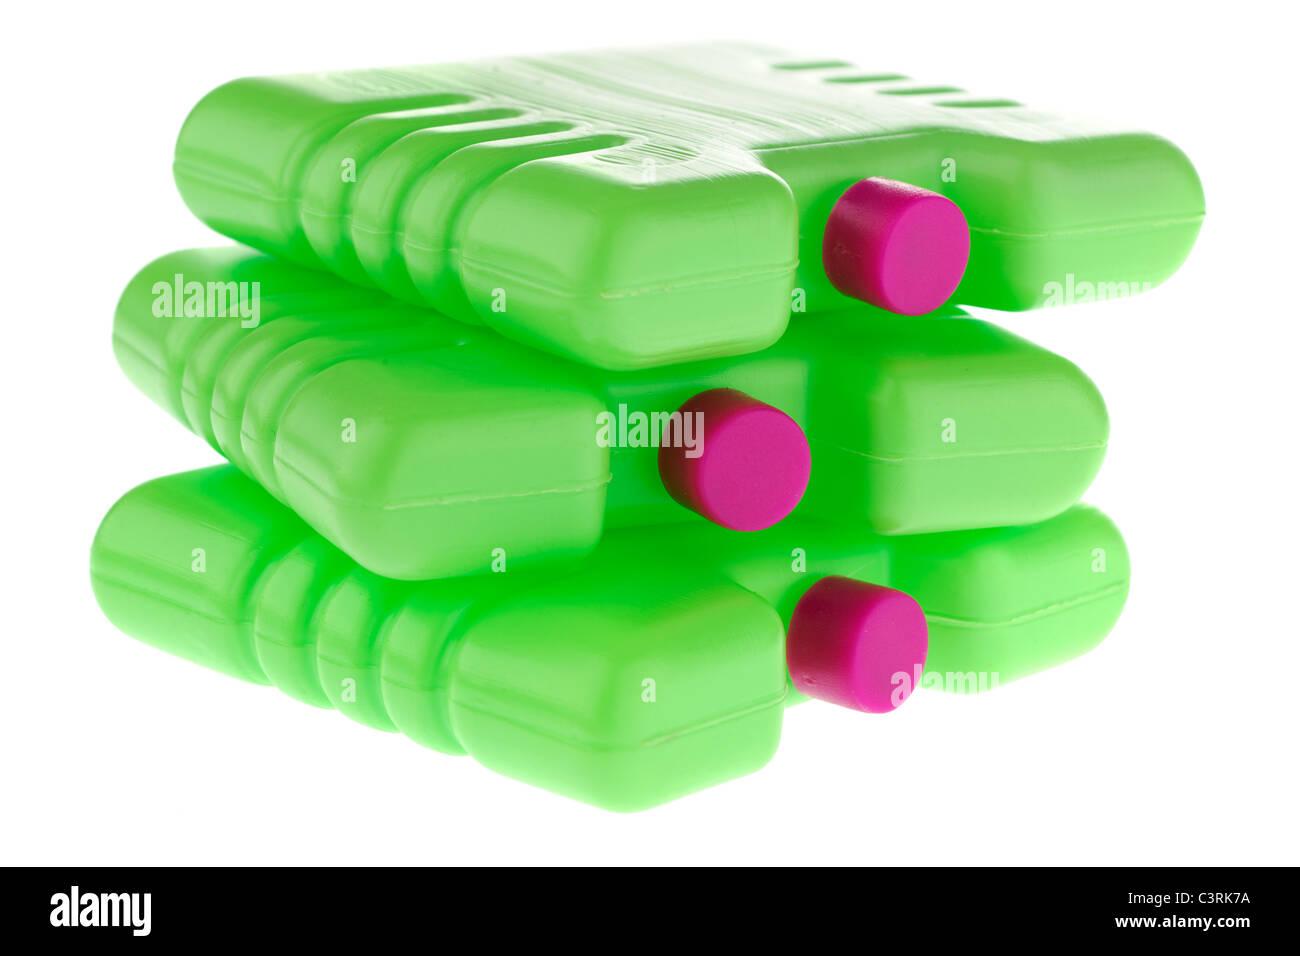 Three plastic green mini freezer blocks - Stock Image